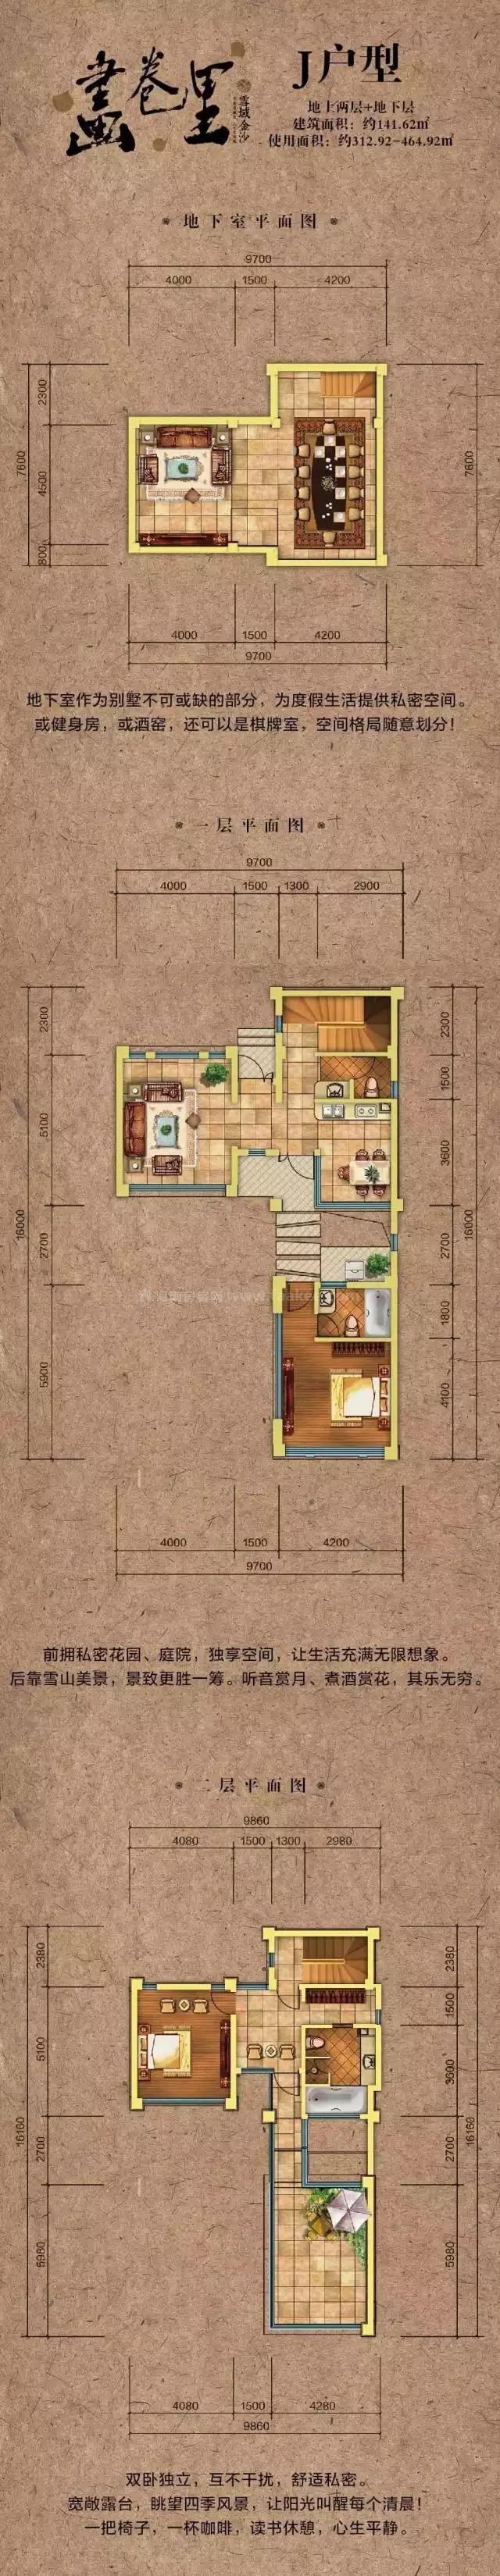 J户型 地上两层+地下层 建面约141.62㎡